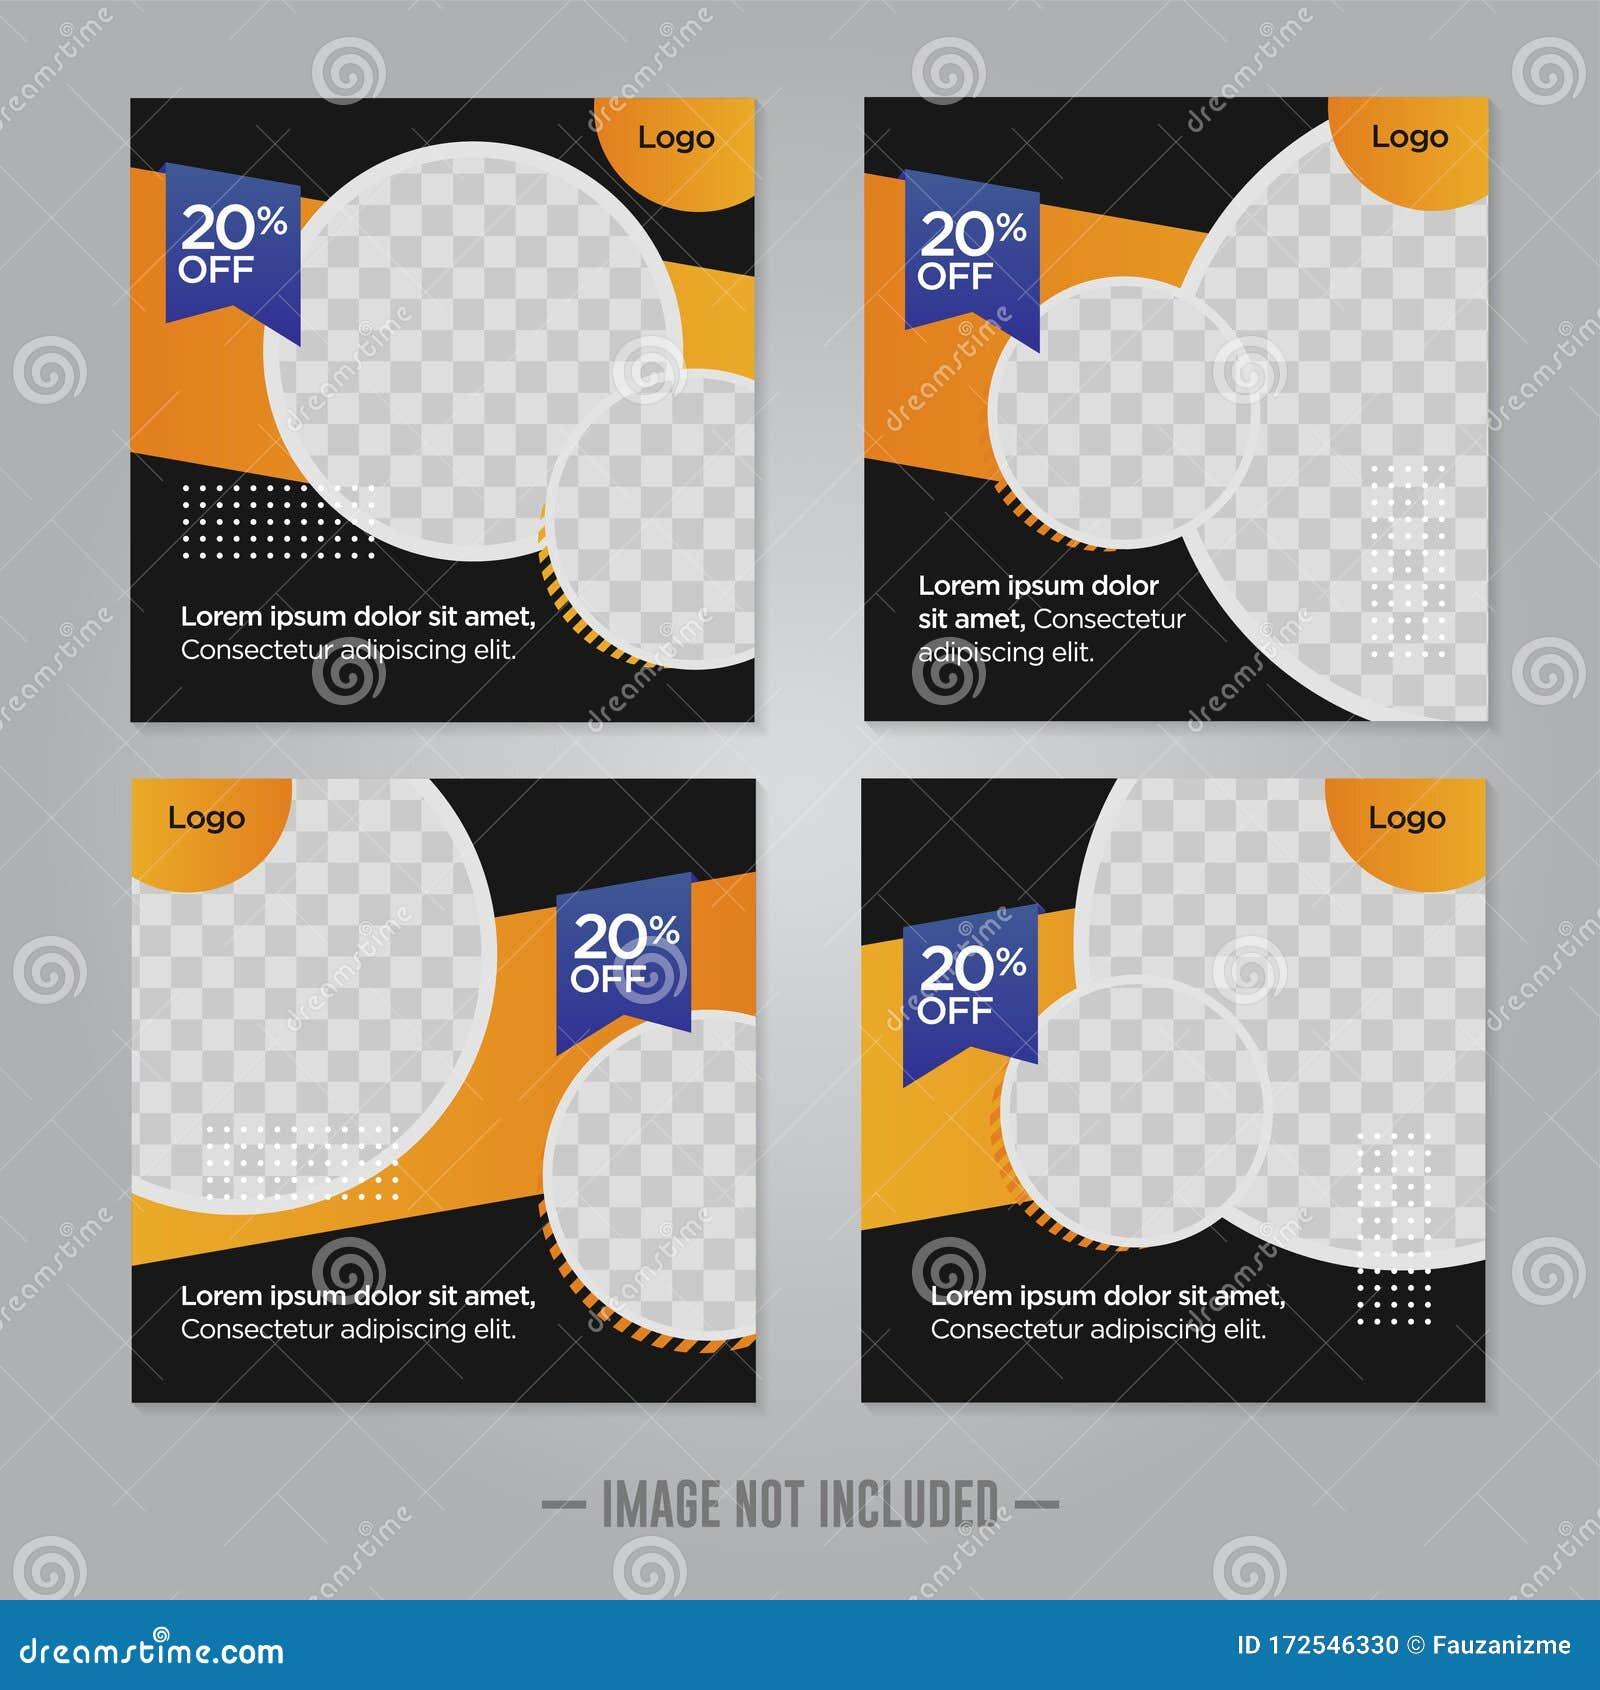 Restaurant Food Social Media Banner Post Design Template Stock Vector Illustration Of Presentation Corporate 172546330